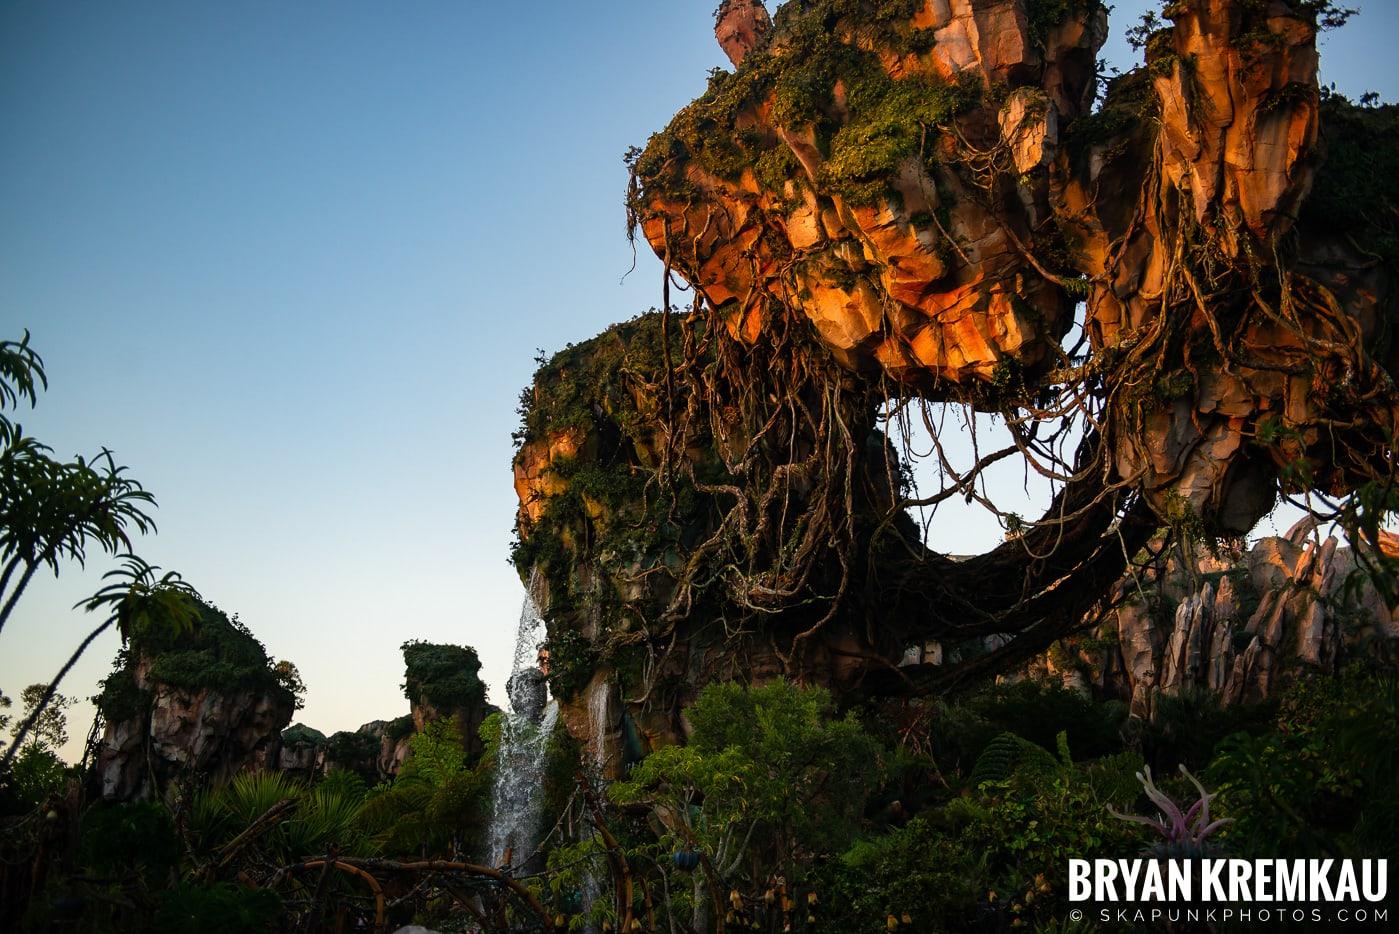 Walt Disney World Vacation: Day 5 (Animal Kingdom / Disney's Hollywood Studios) - 10.3.19 (81)